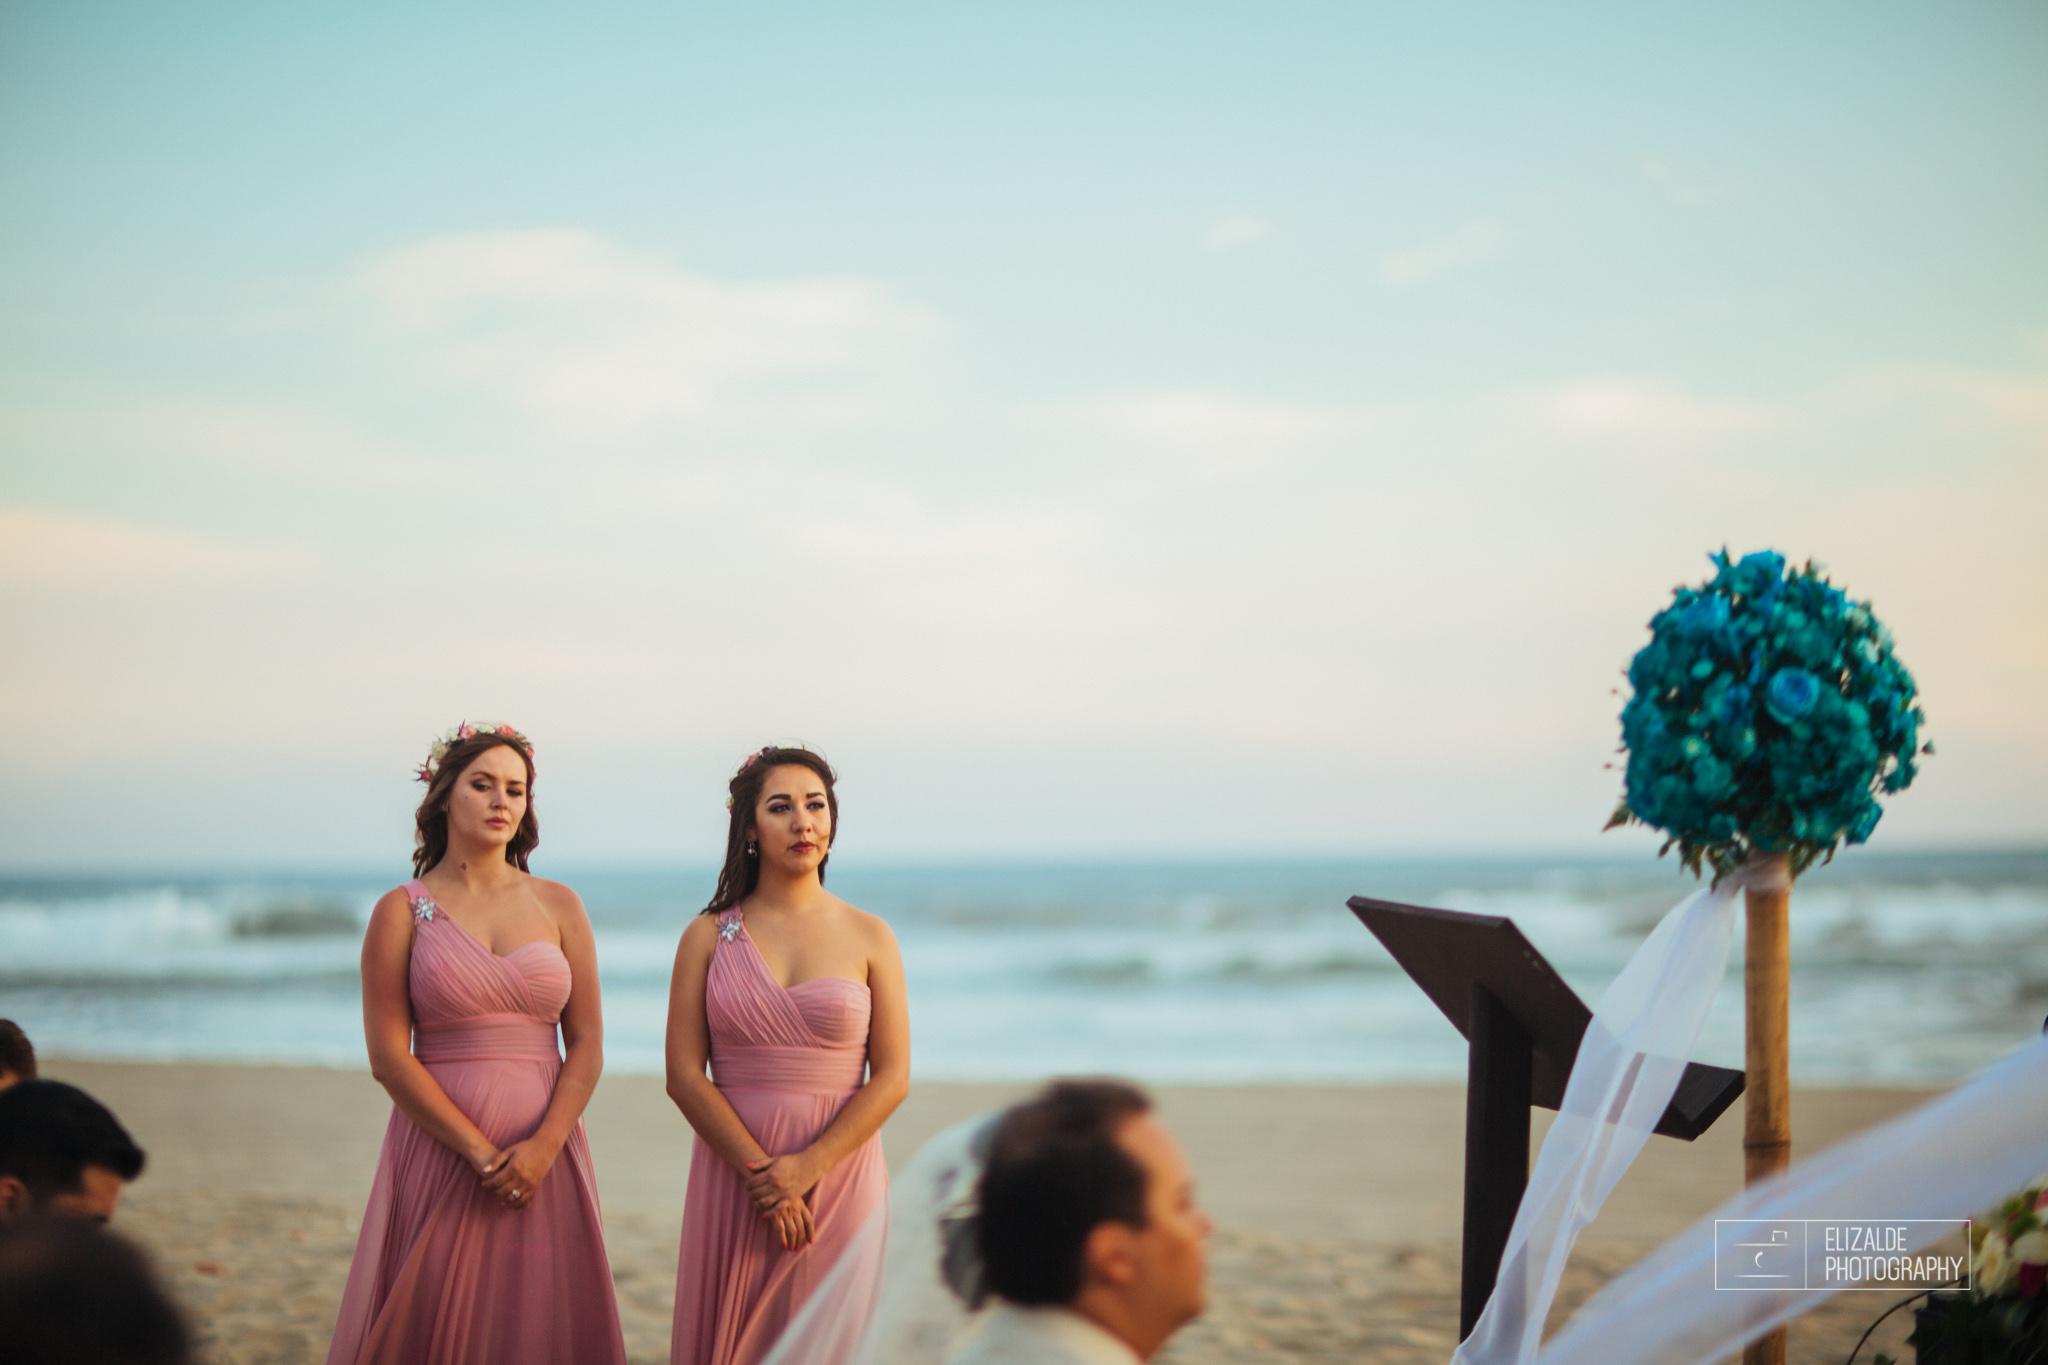 Pay and Ferran_Acapulco_Destination Wedding_Elizalde Photography-91.jpg